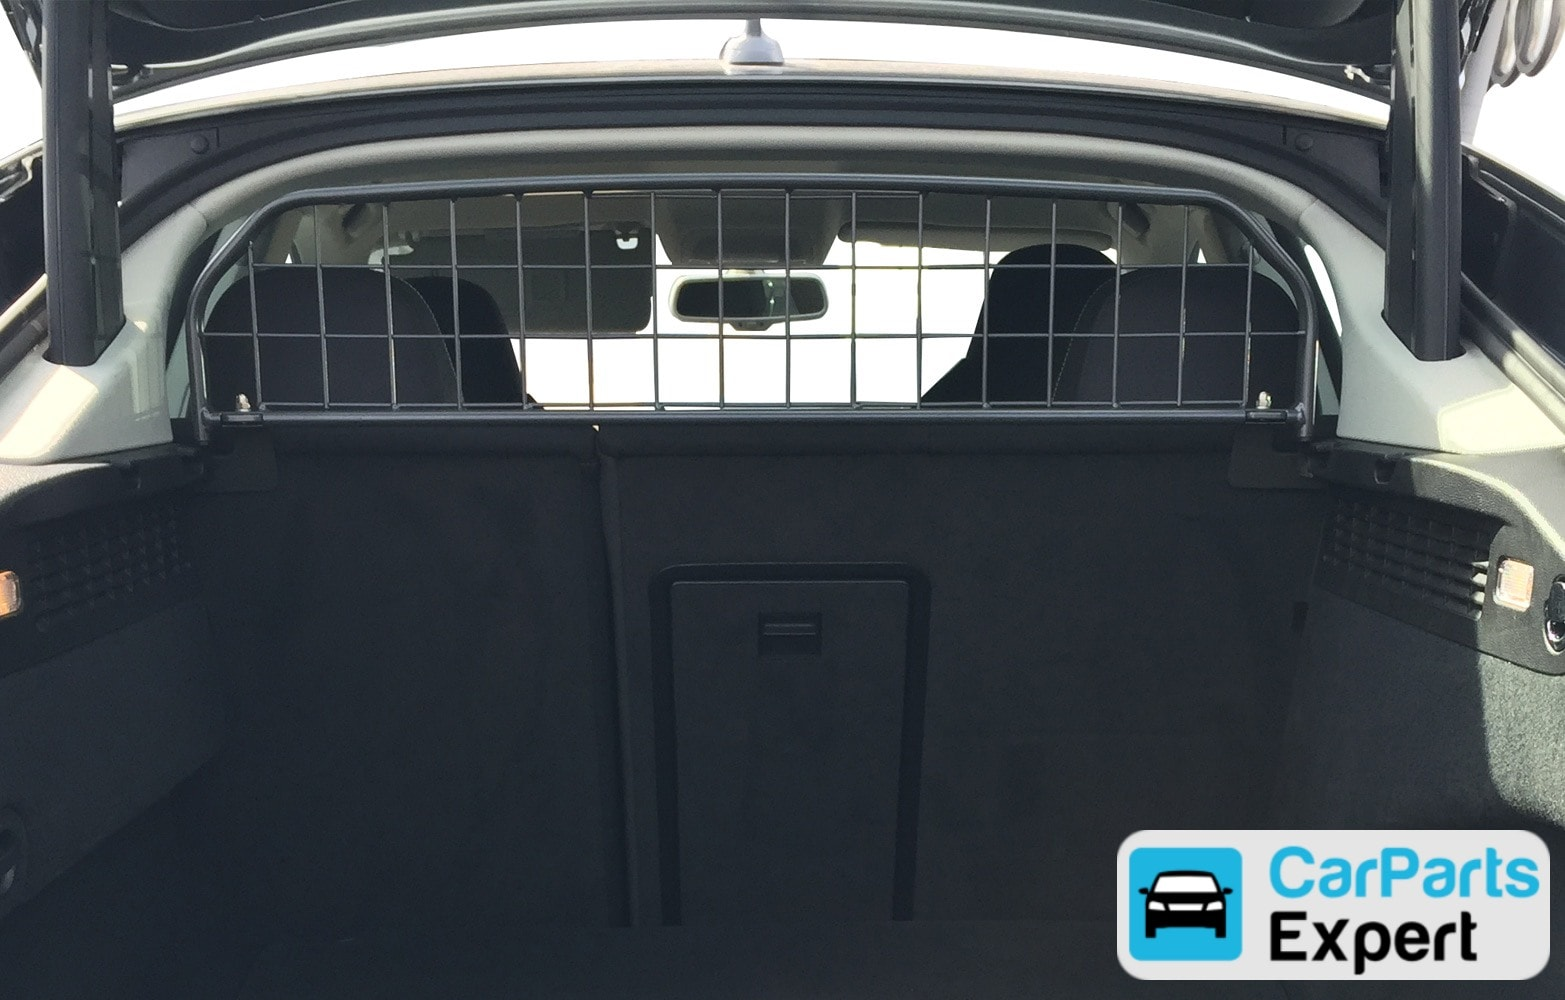 Audi a7 sportback 4g 2010 present 5 door dog guard hundegitter